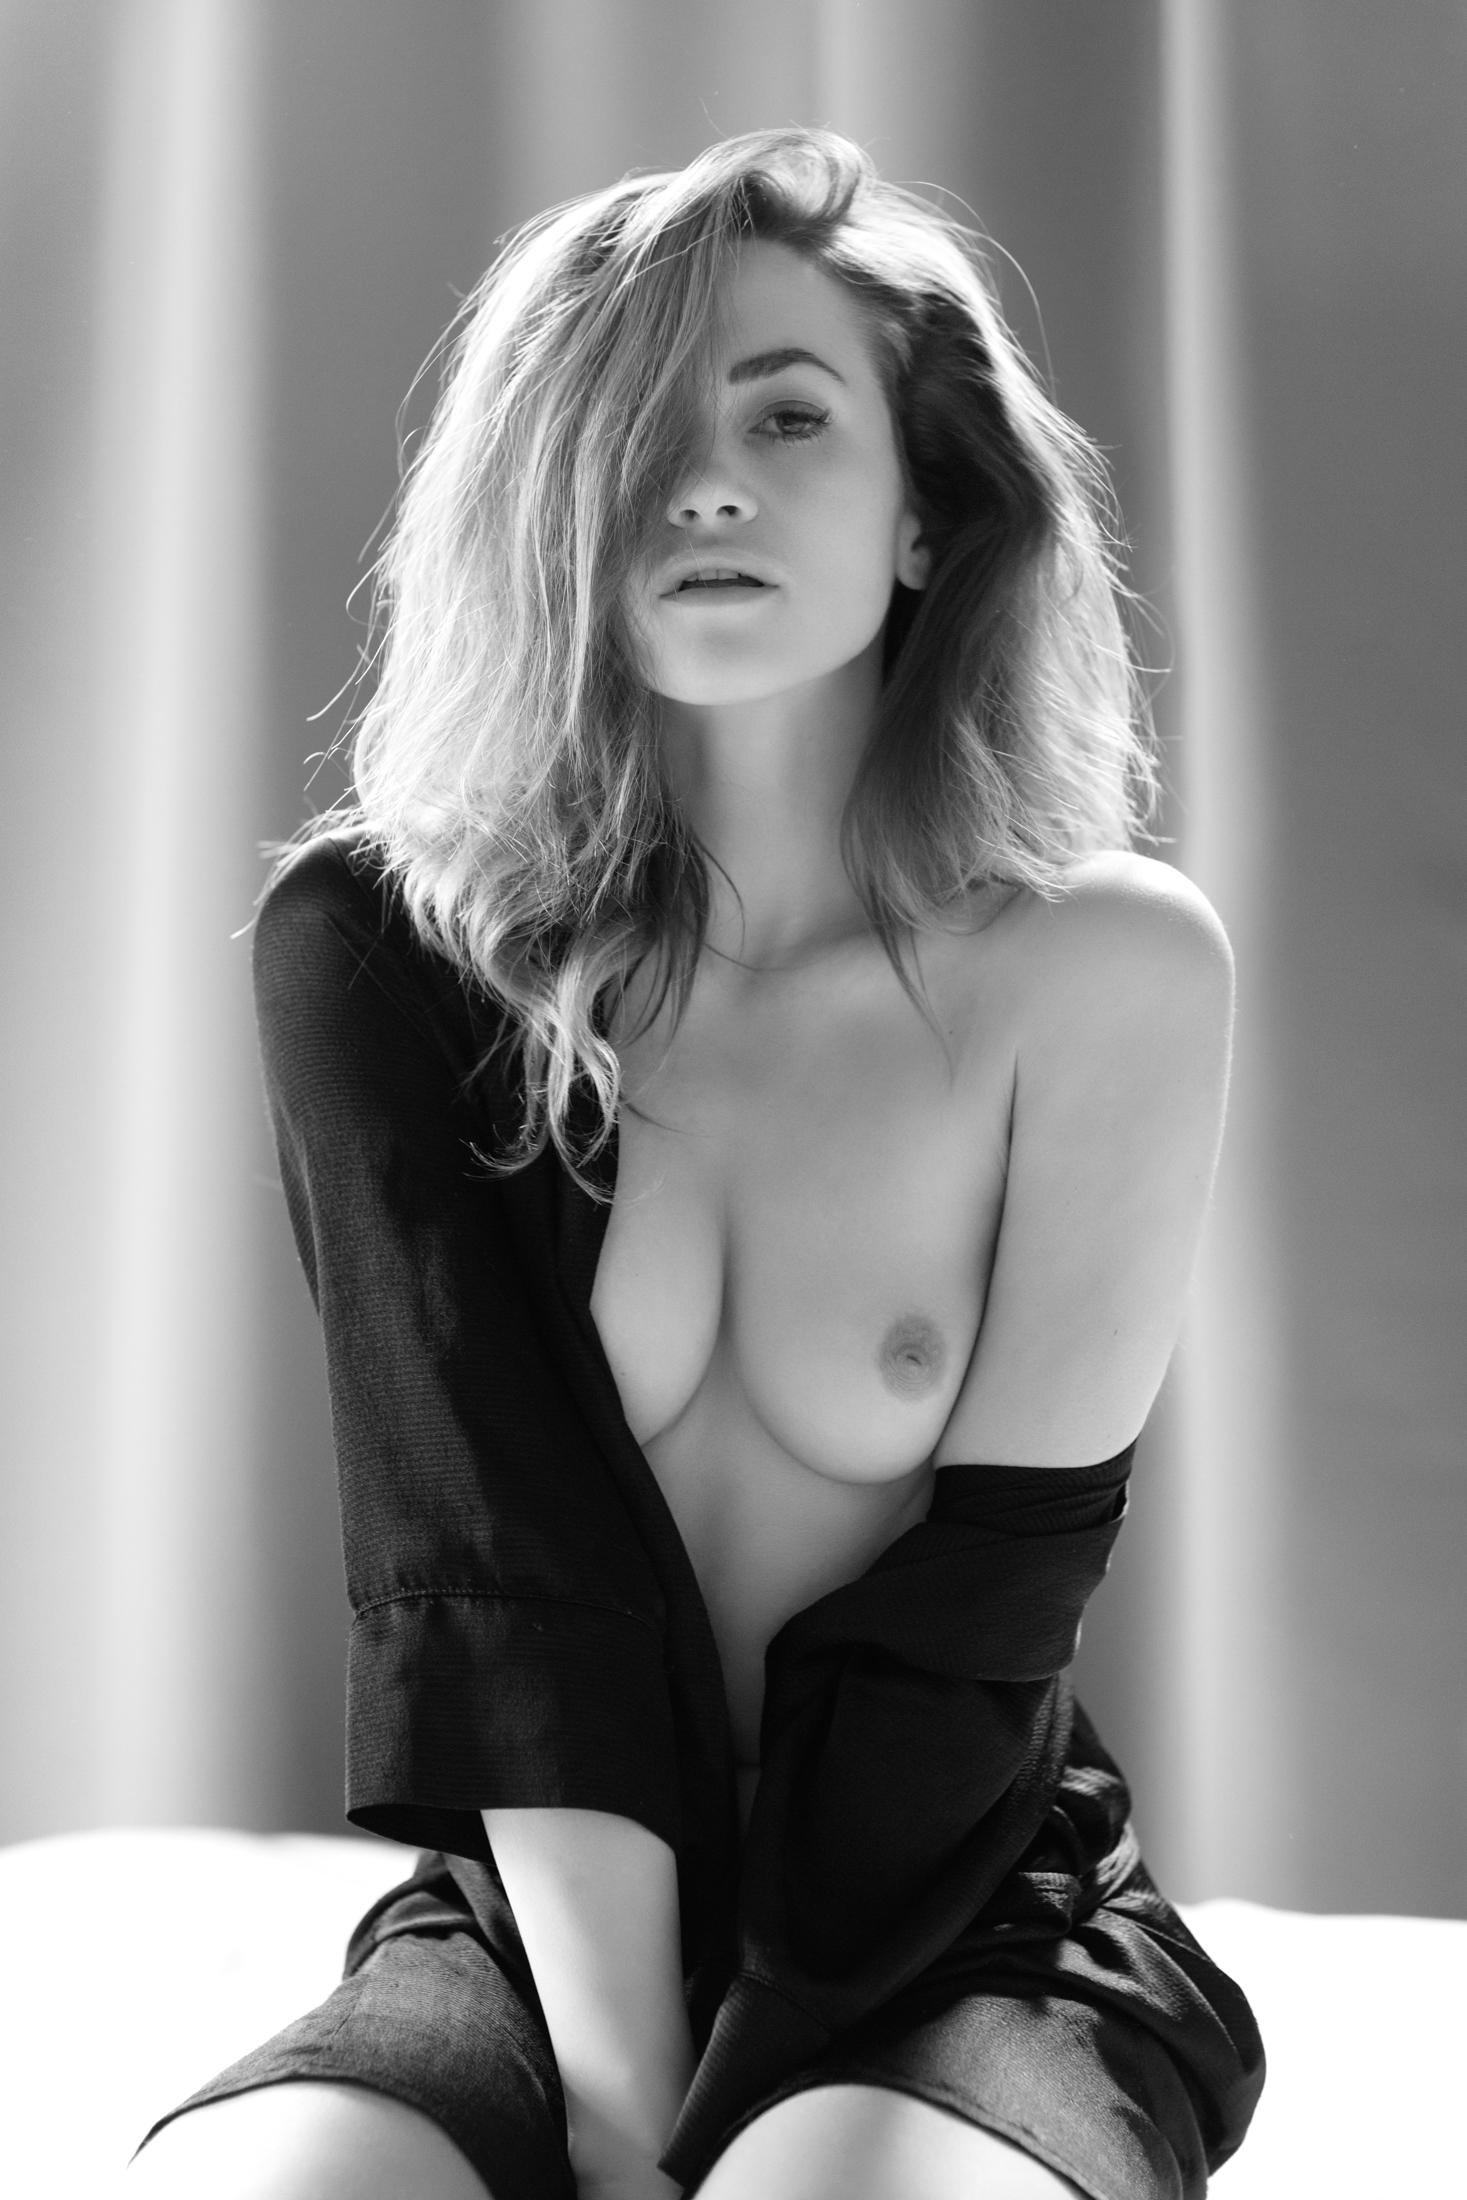 tereza sensual portrait in studio frankfurt 04